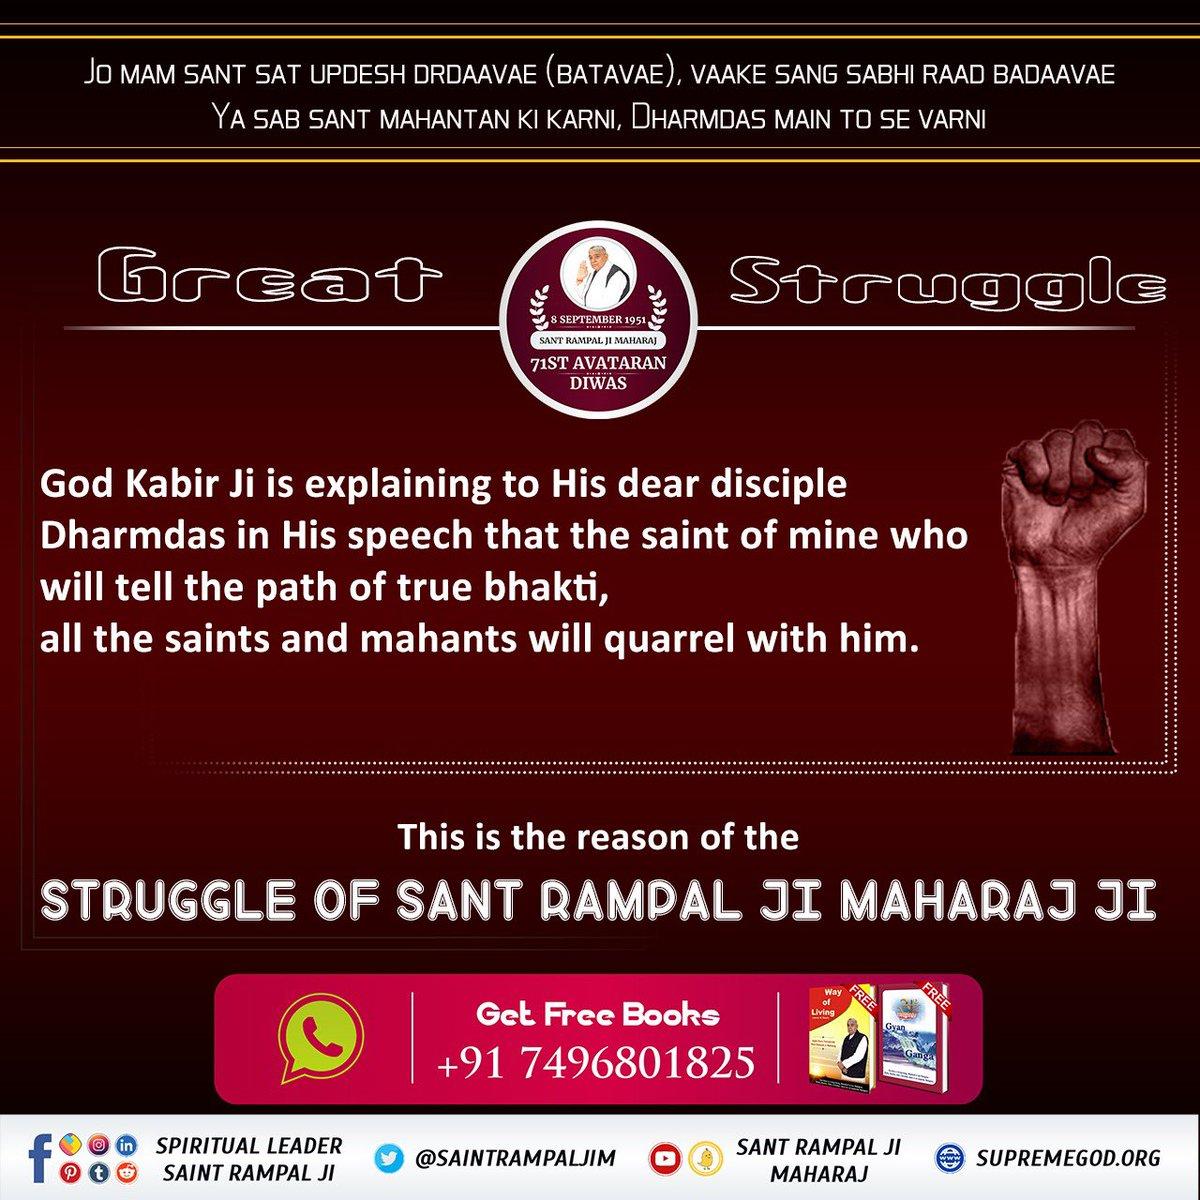 Identity of a CompleteSant  Kabir Sahib Ji says in His speech: Jo mam sant sat updesh drdaavae (batavae), vaake sang sabhi raad badaavae | Ya sab sant mahantan ki karni, Dharmdas main to se varni ||  This is the reason of the Struggle of Sant Rampal Ji Maharaj  #EngineersDay https://t.co/9zMkFDB0rX